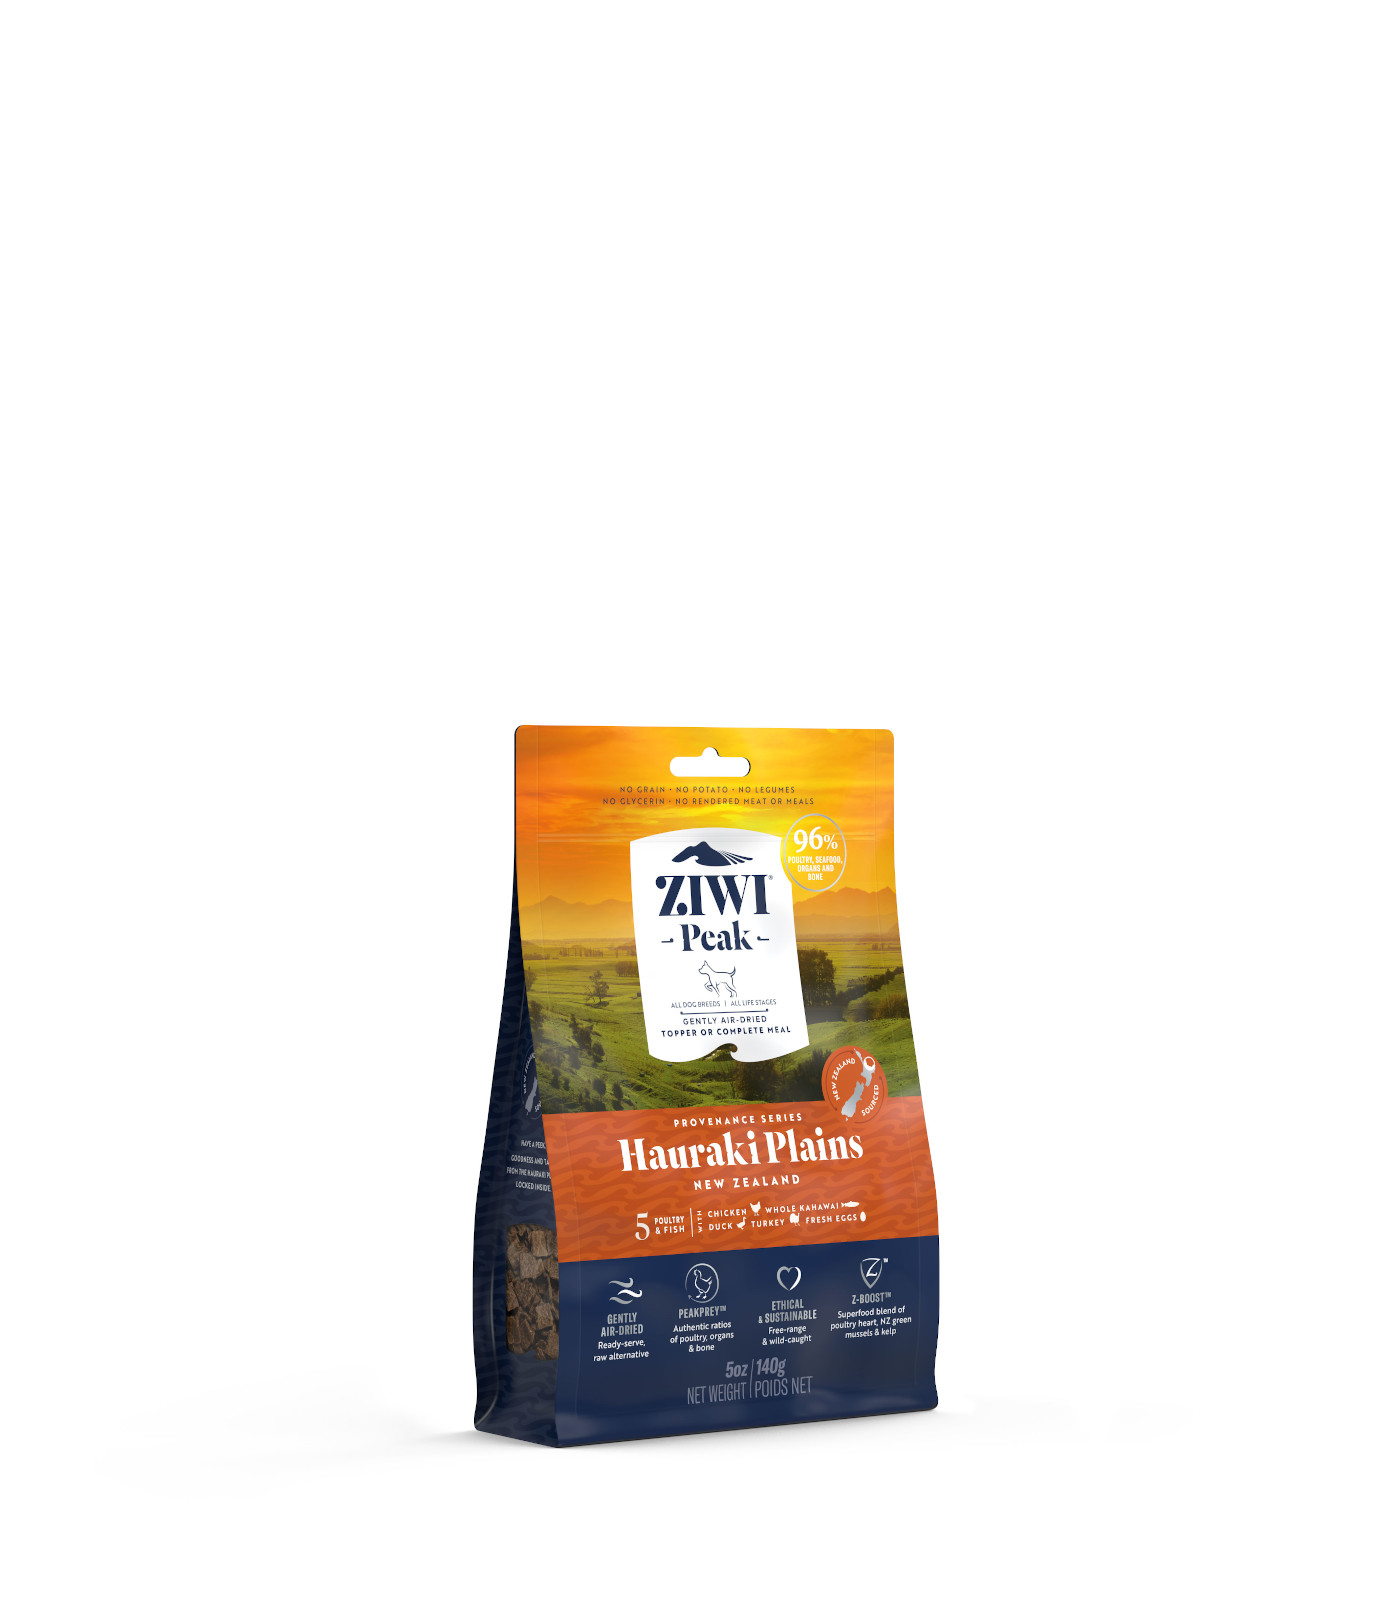 ZIWI Peak Provenance Air-Dried Dog Food Hauraki Plains Recipe, 5-oz